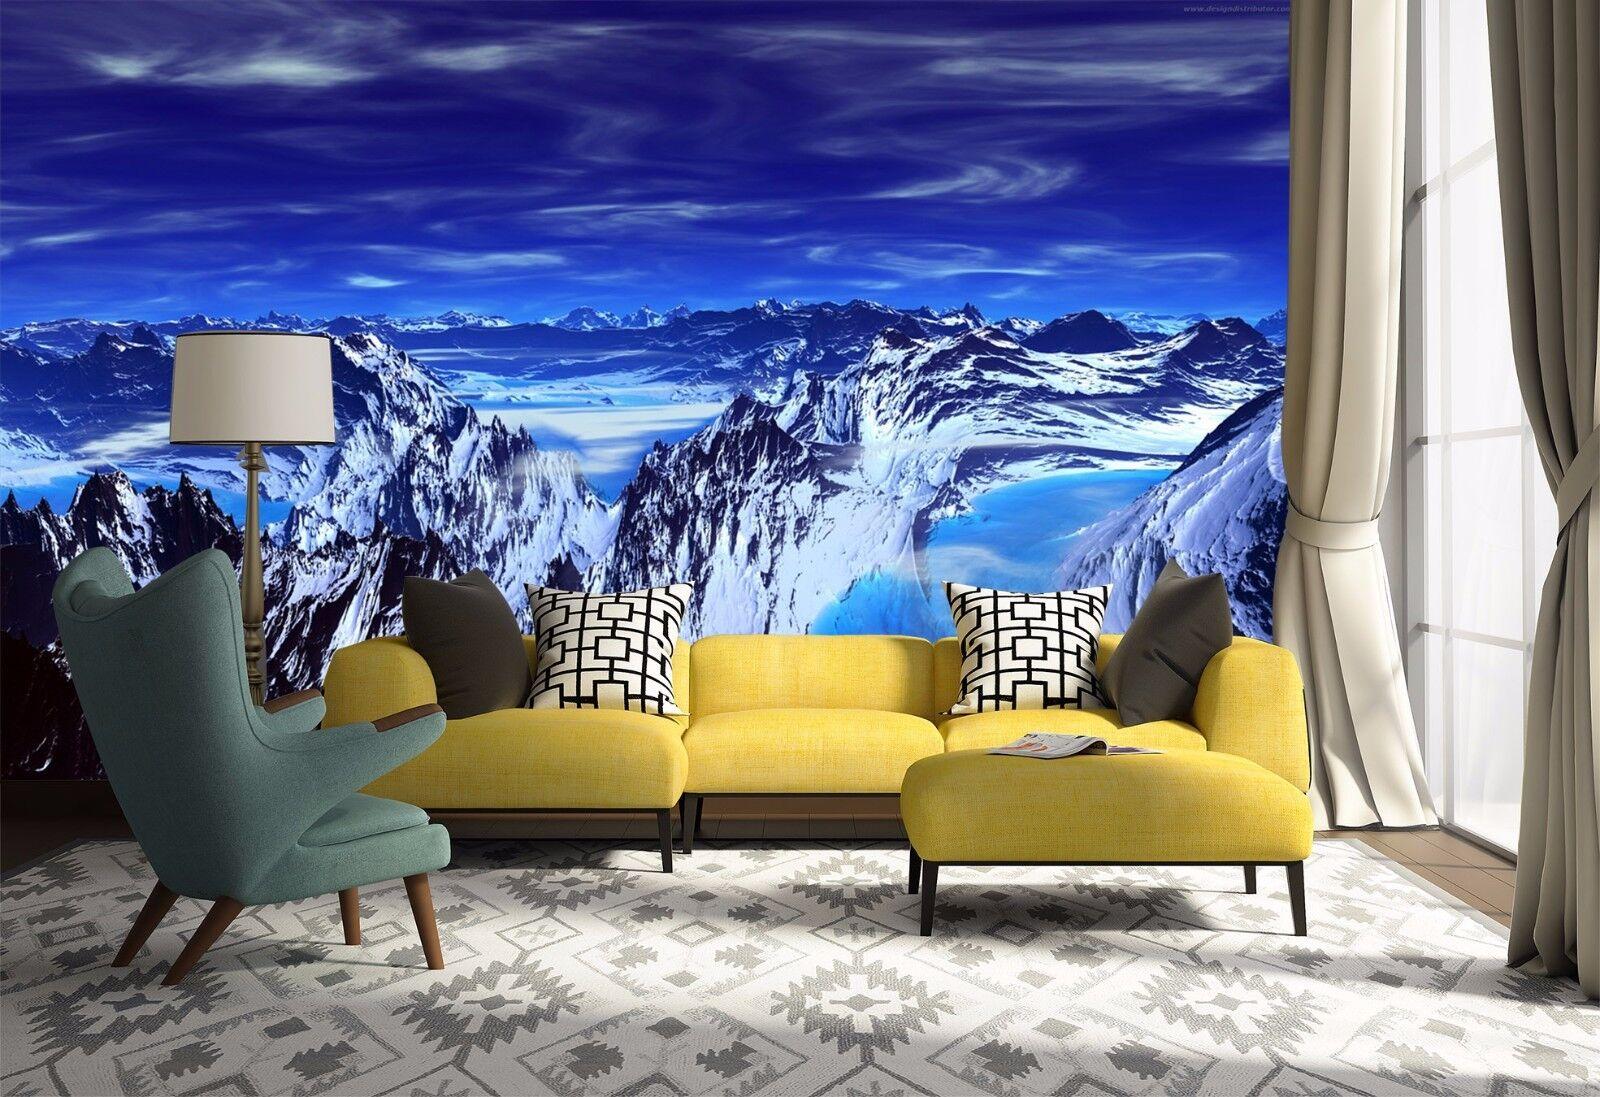 3D Bule Hills Sky 51 Wallpaper Murals Wall Print Wallpaper Mural AJ WALL AU Kyra